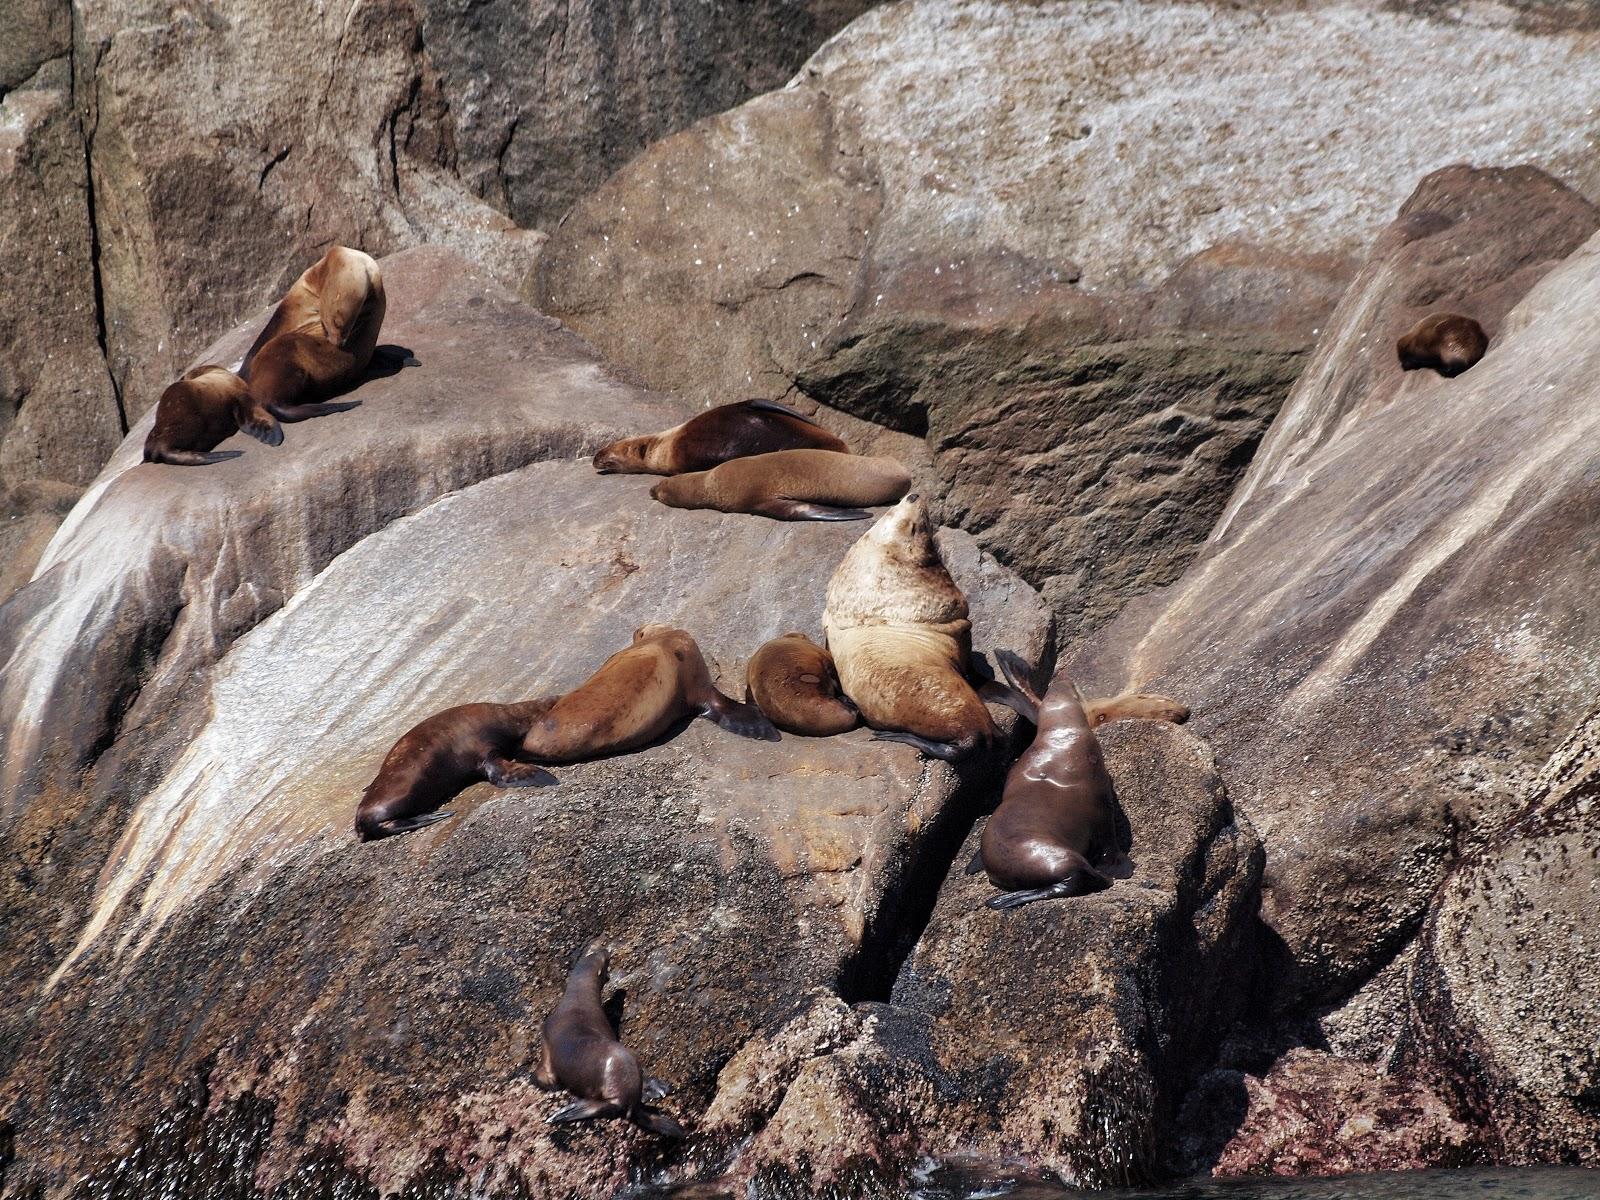 Stellar Sea Lions, #alaska #resurrectionbay #kenai 2013 #Stellar Sea Lions